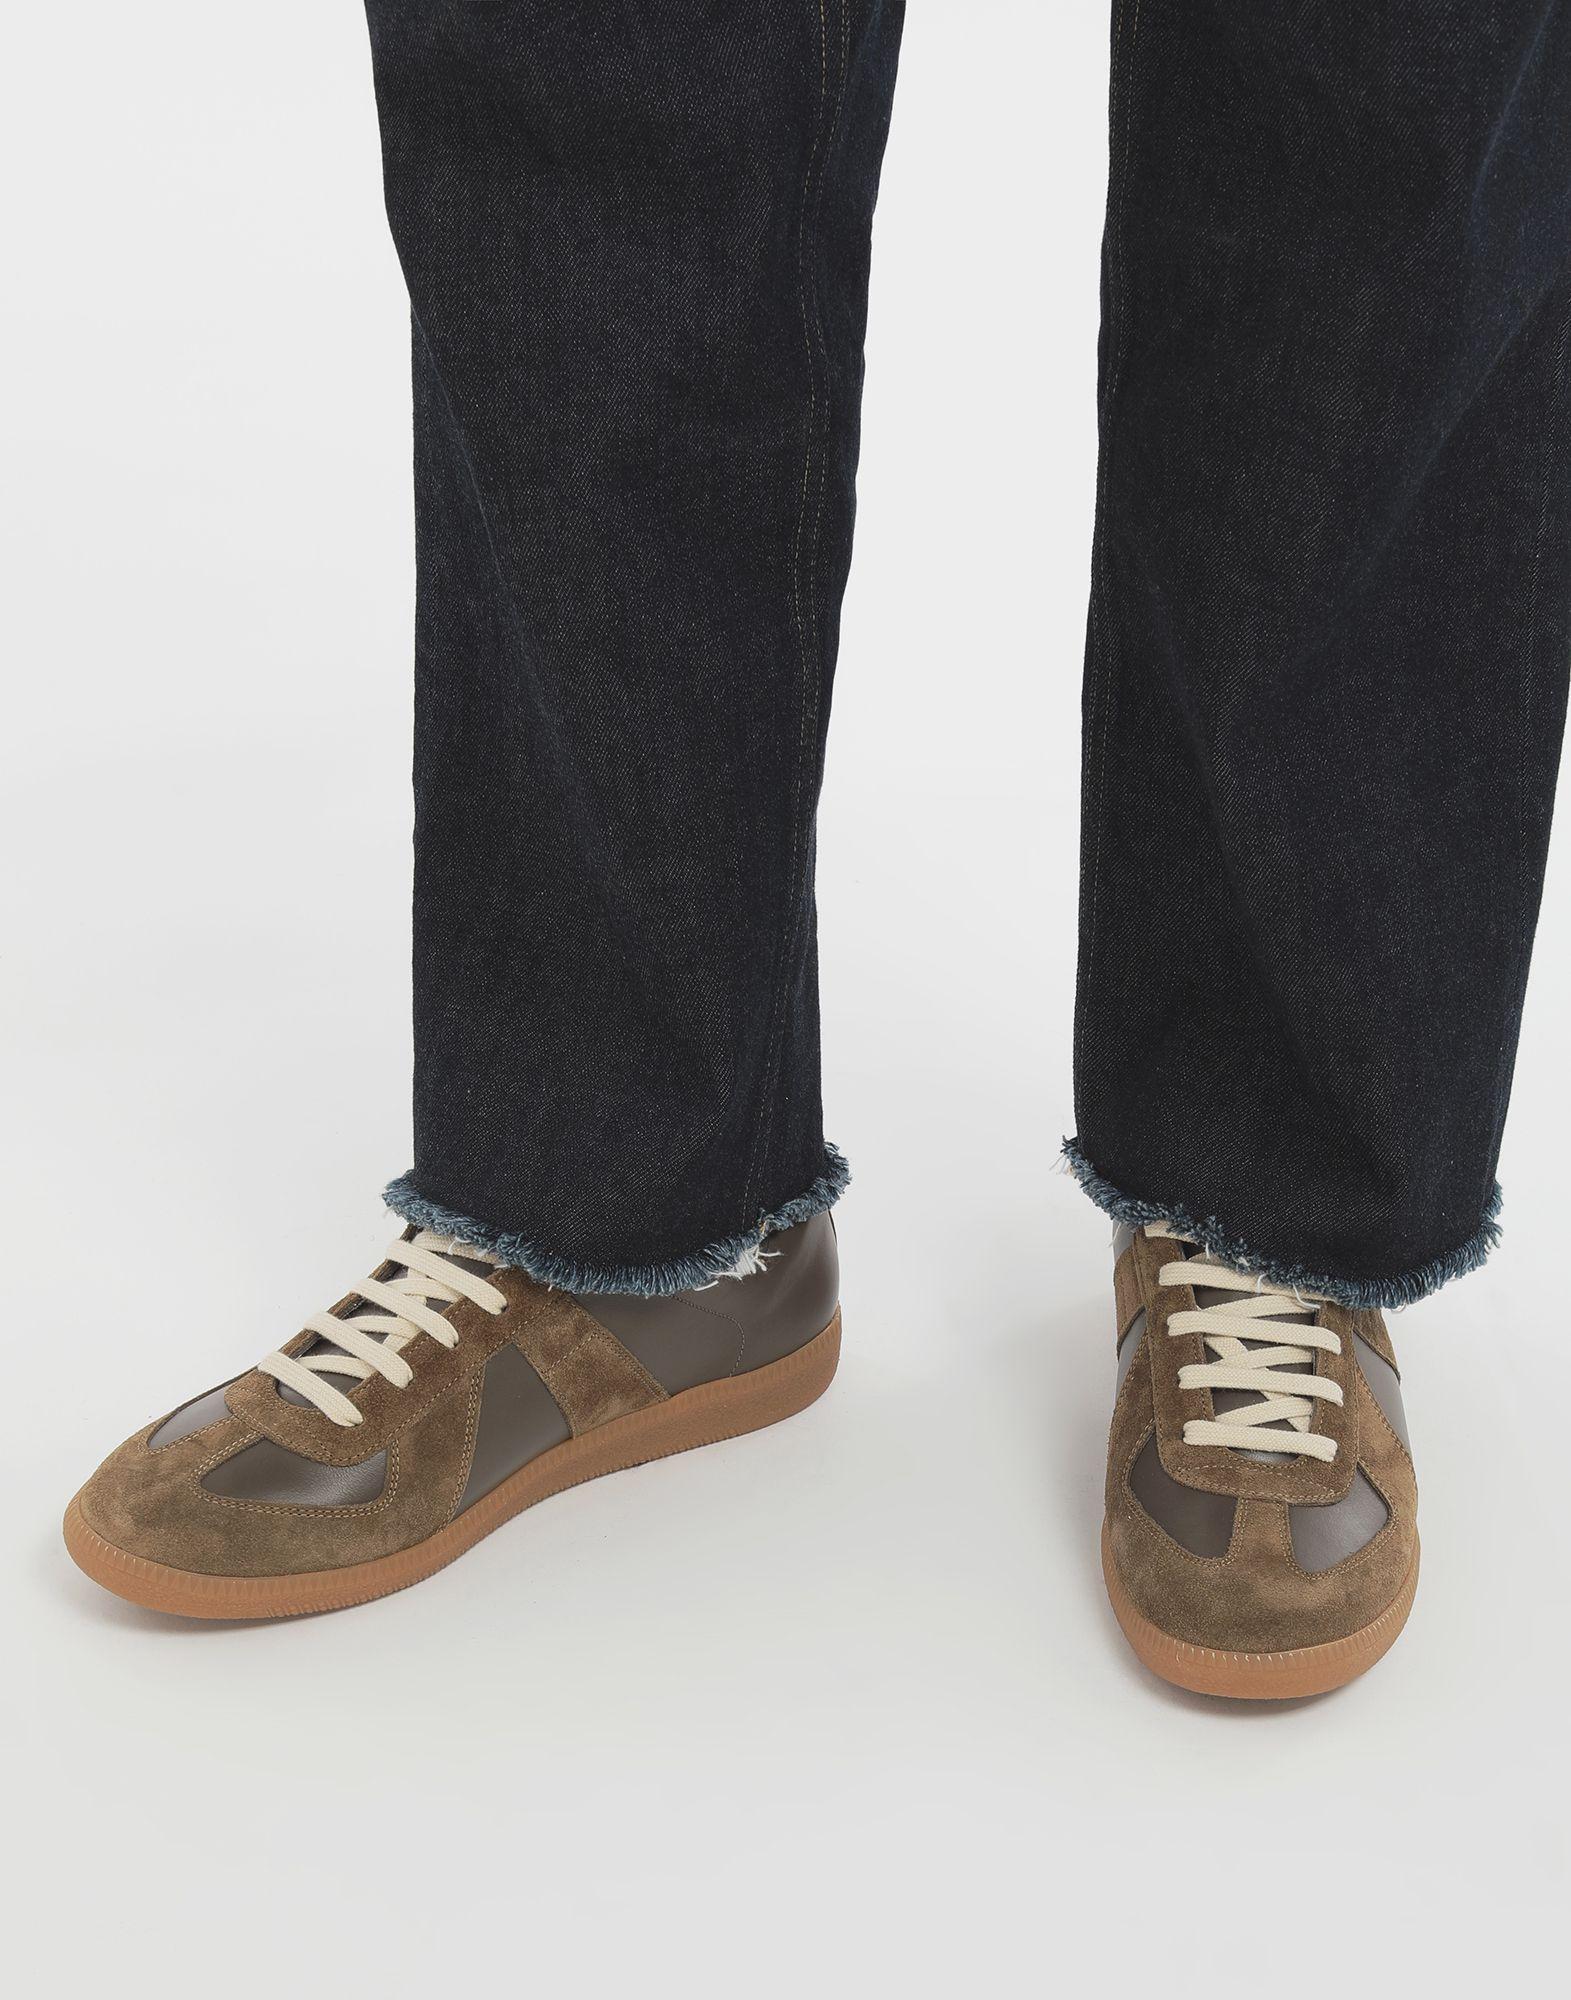 MAISON MARGIELA Replica sneakers Sneakers Man r